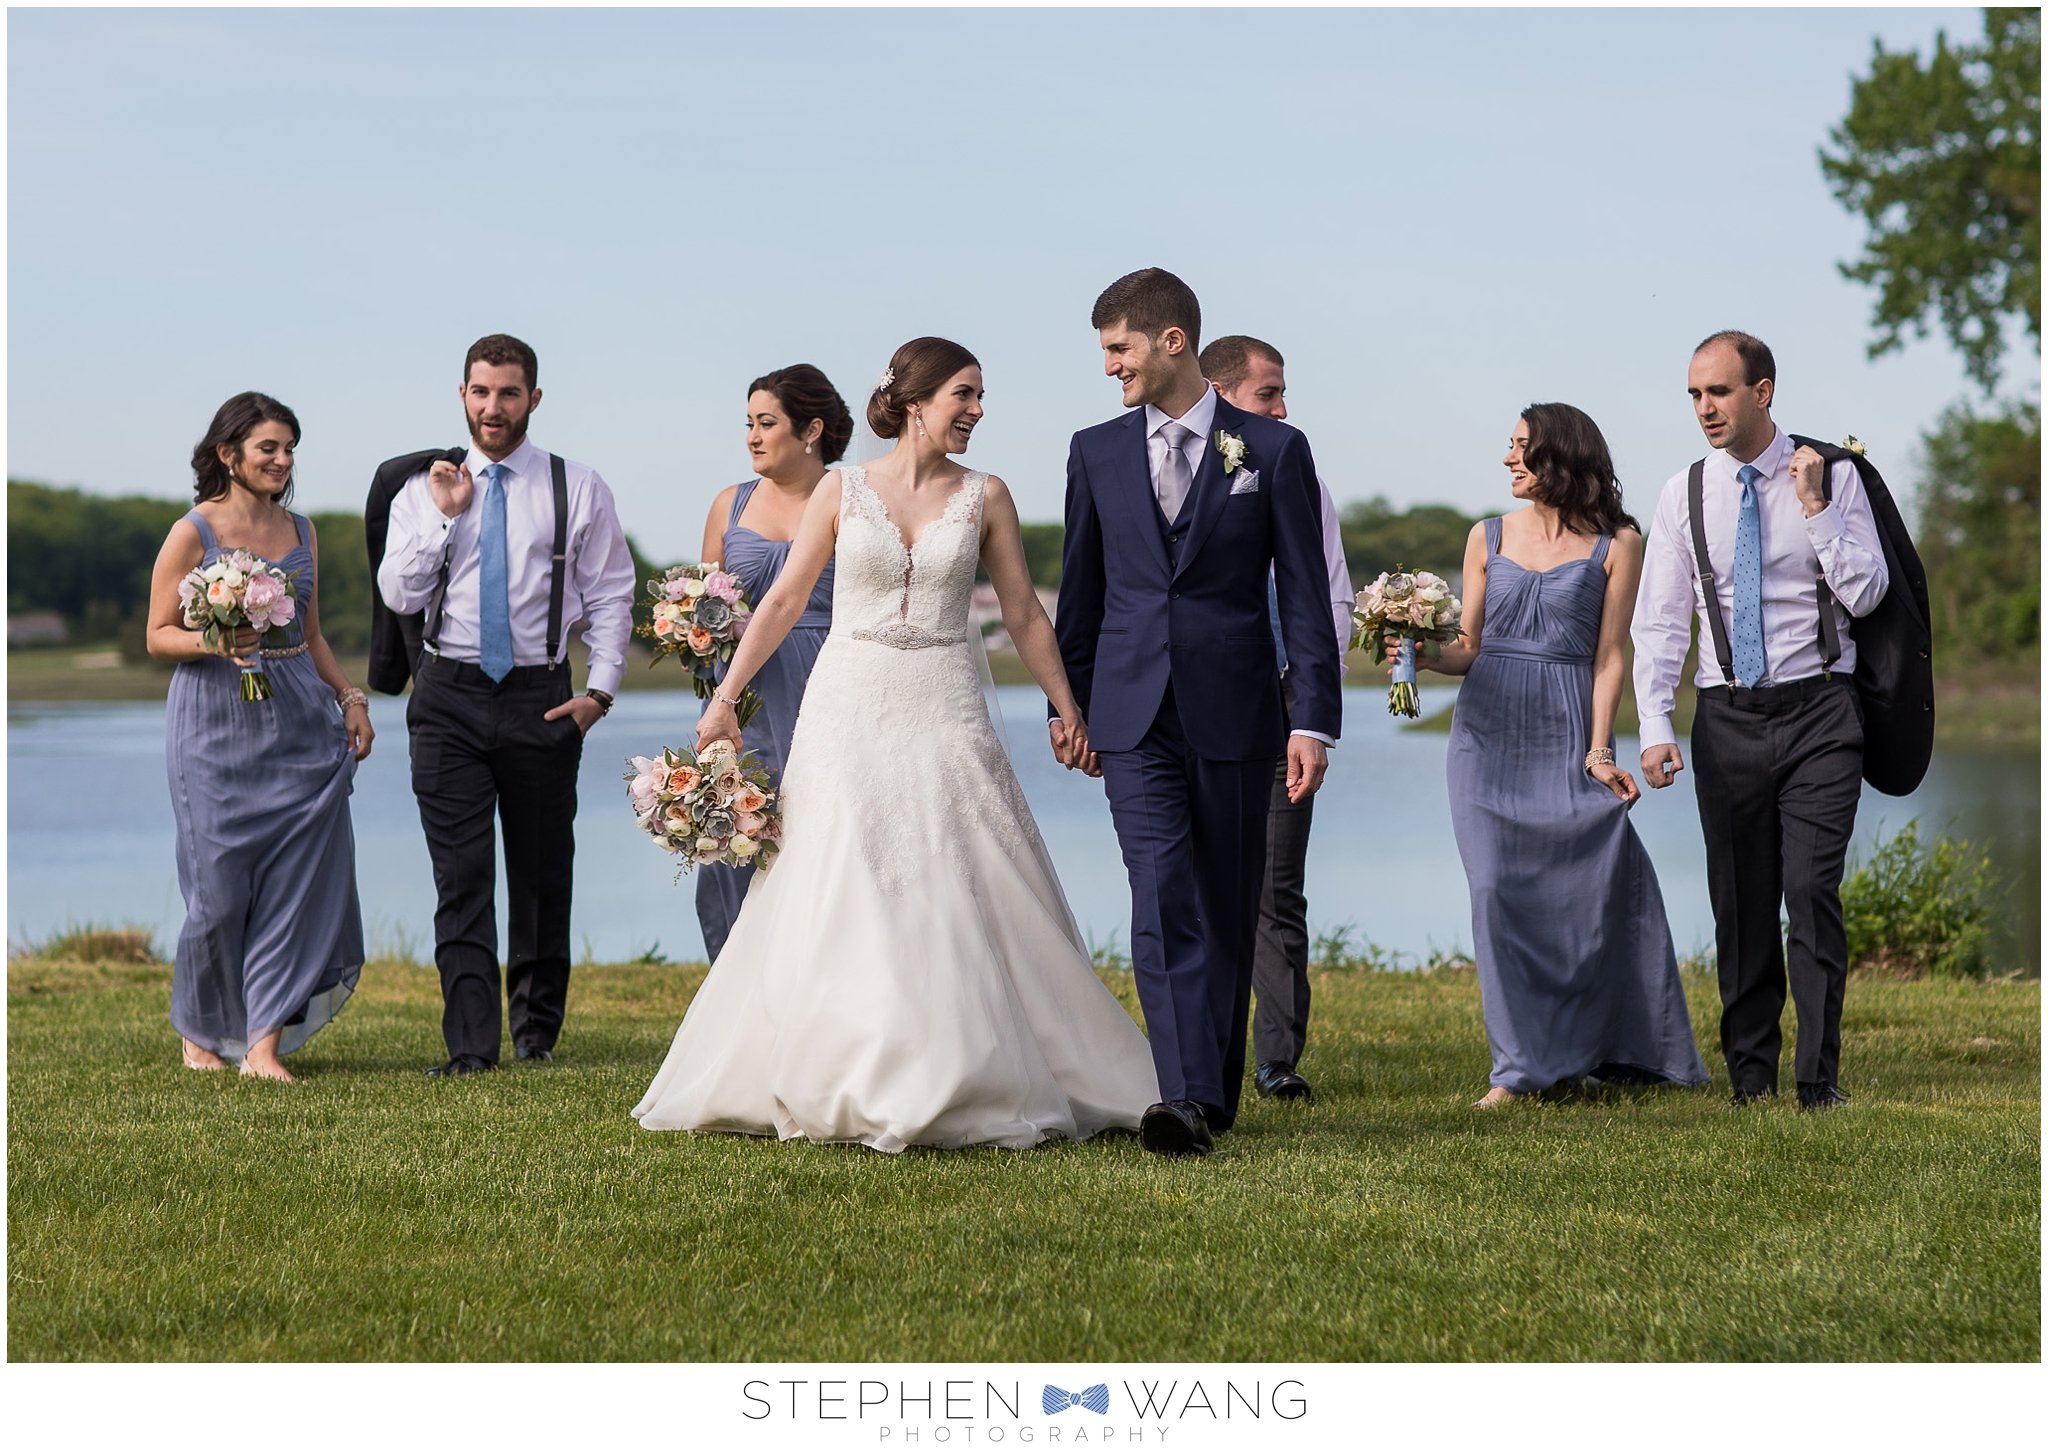 Stephen Wang Photography Shorehaven Norwalk CT Wedding Photographer connecticut shoreline shore haven - 23.jpg